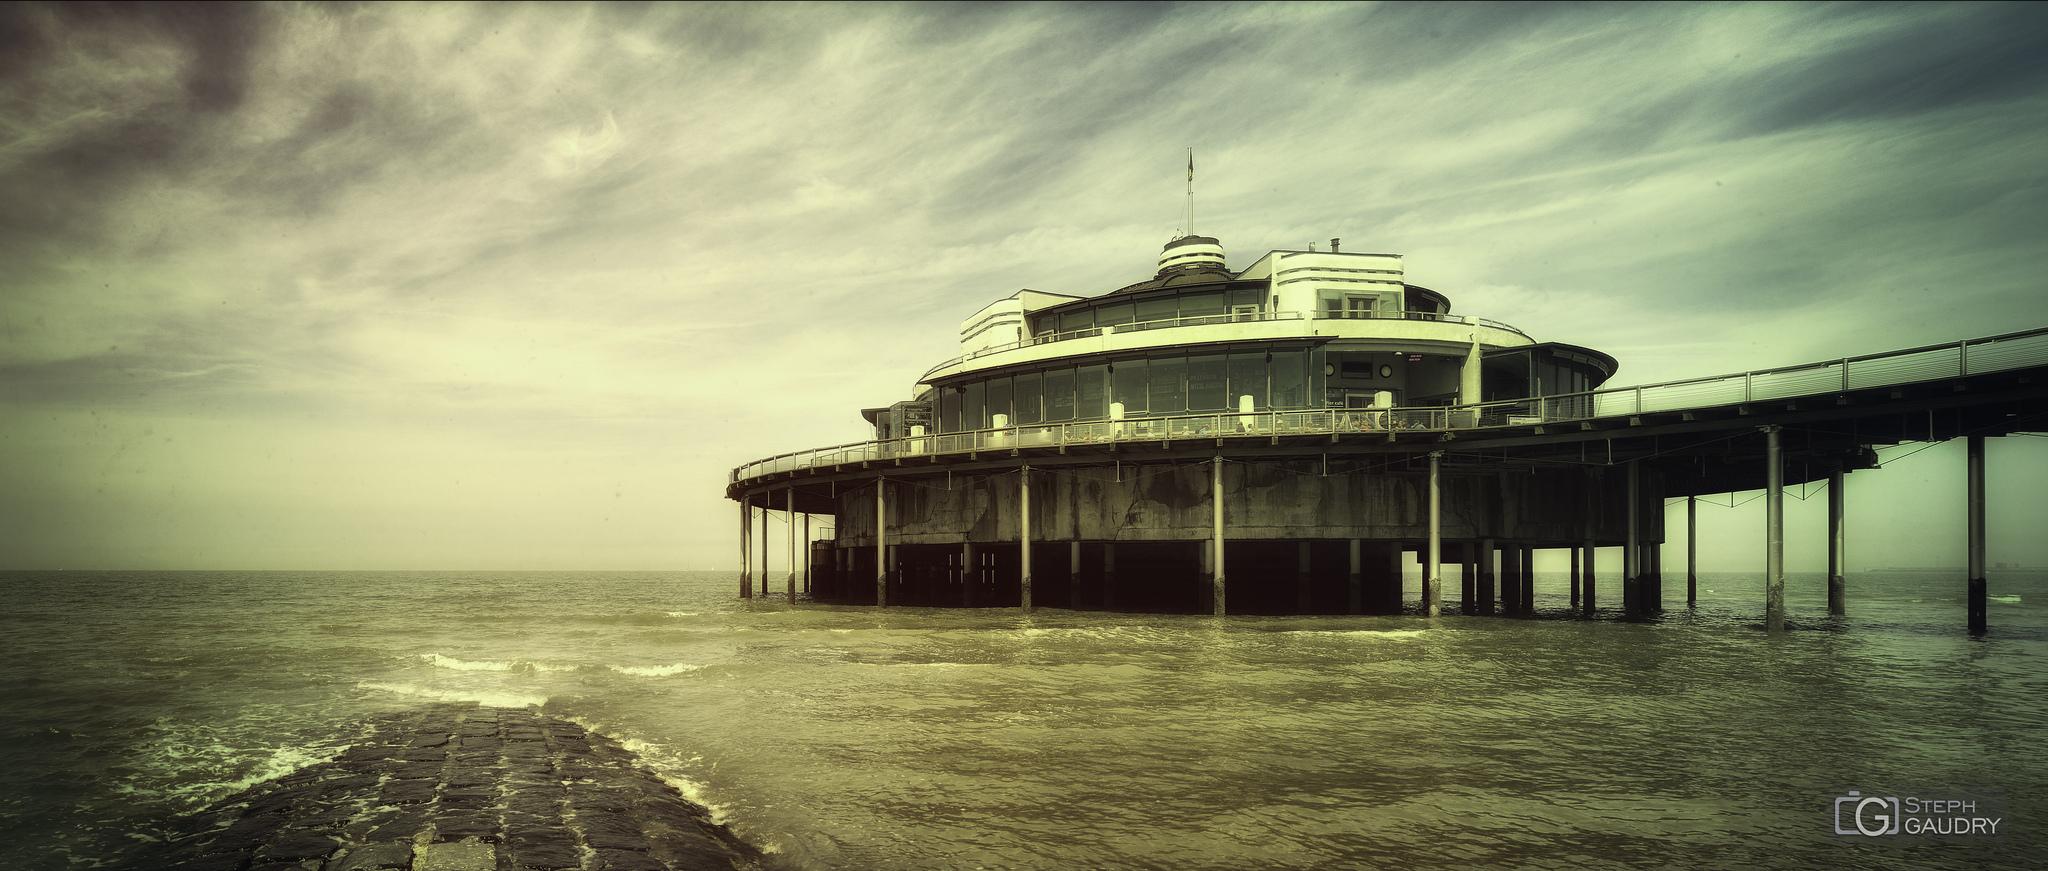 De Pier - Fallout [Click to start slideshow]